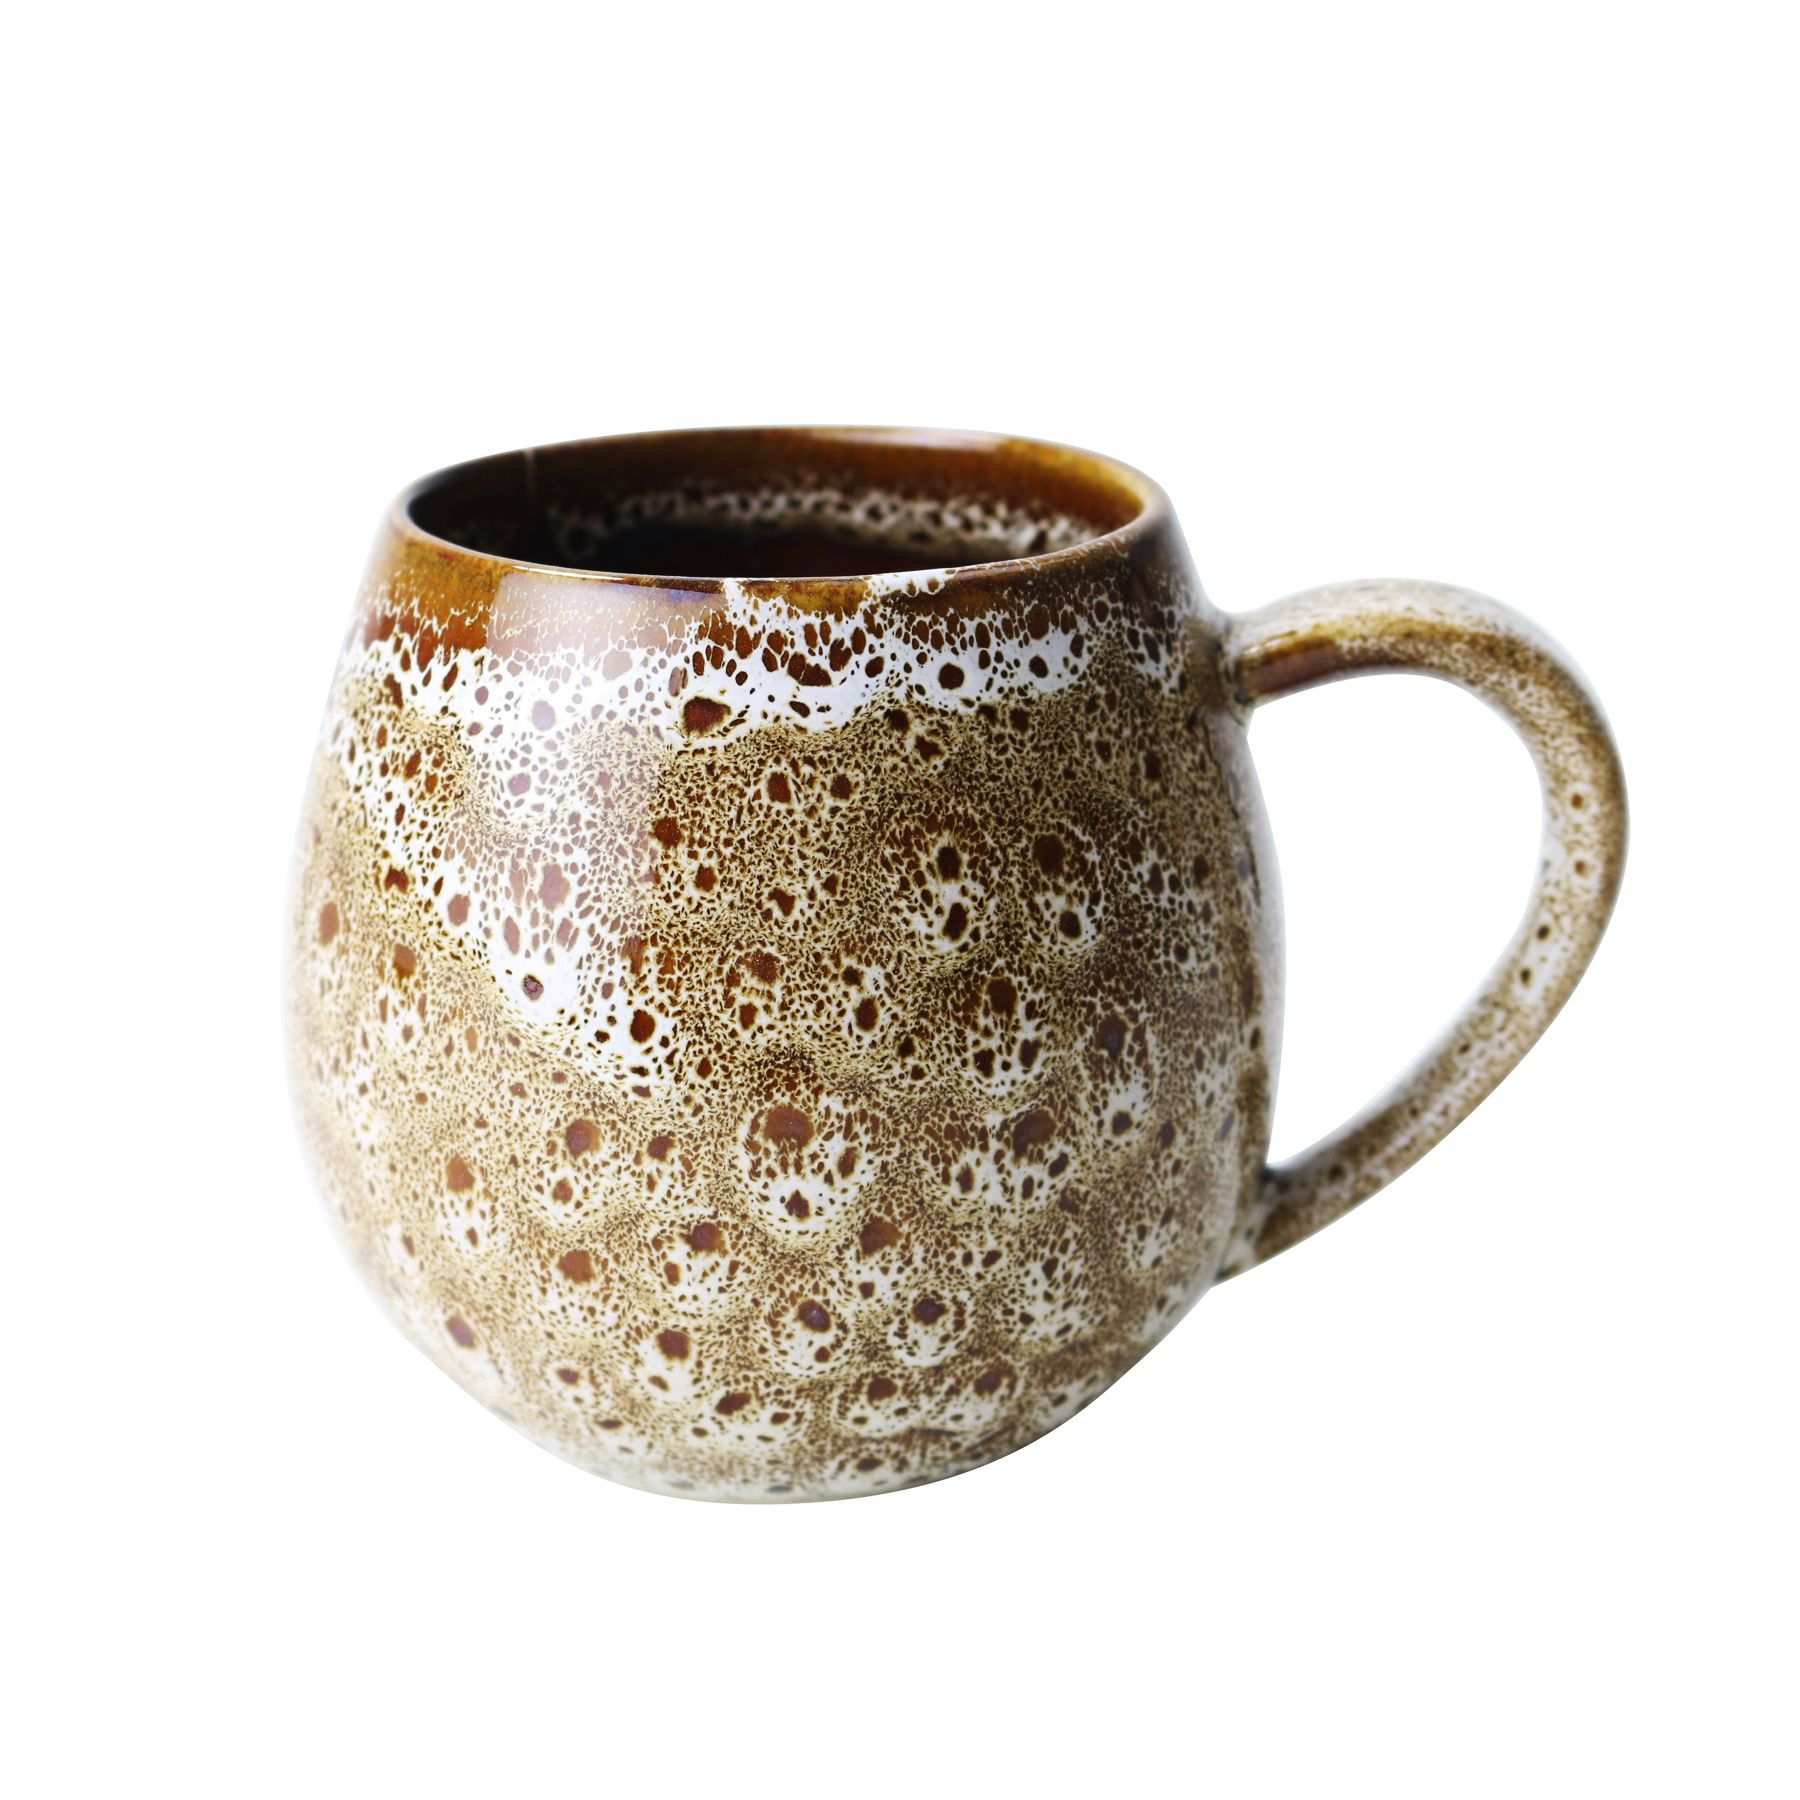 Canvas Mug White Ochre Robert Gordon Australia Mugs Childrens Mugs Ochre